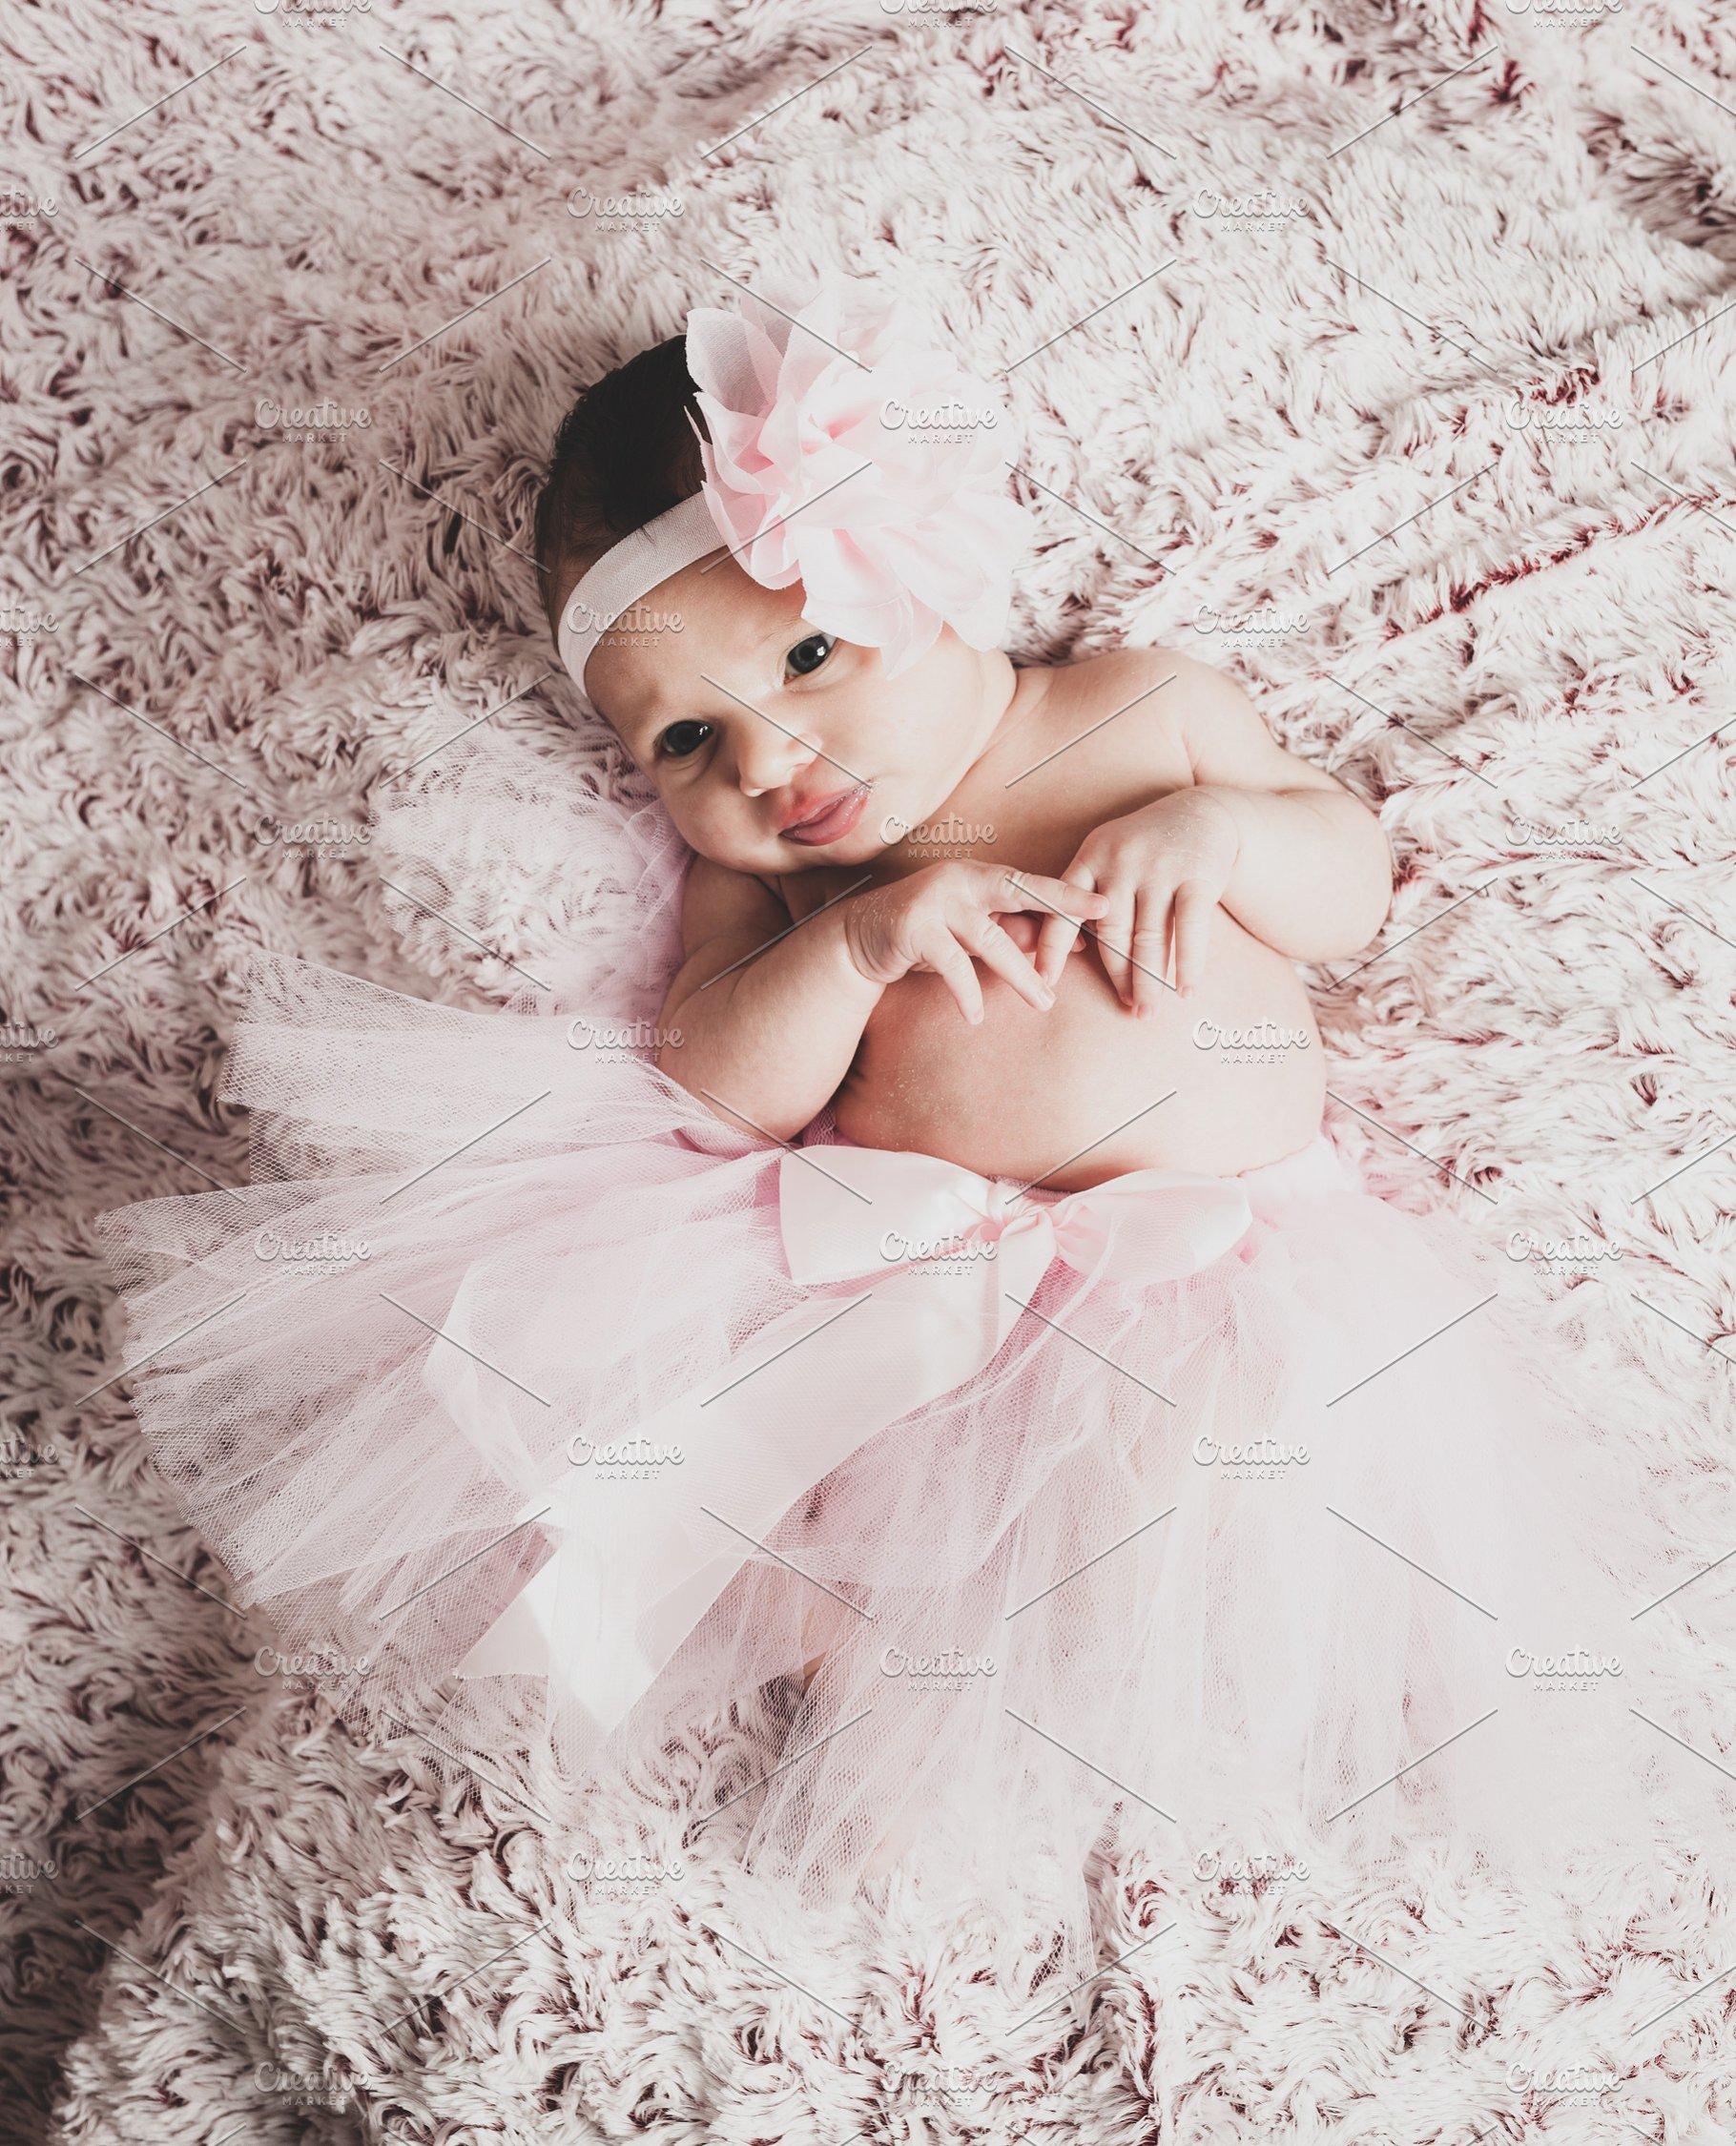 36ffebdcb Newborn baby girl wearing a pink bal ~ People Photos ~ Creative Market